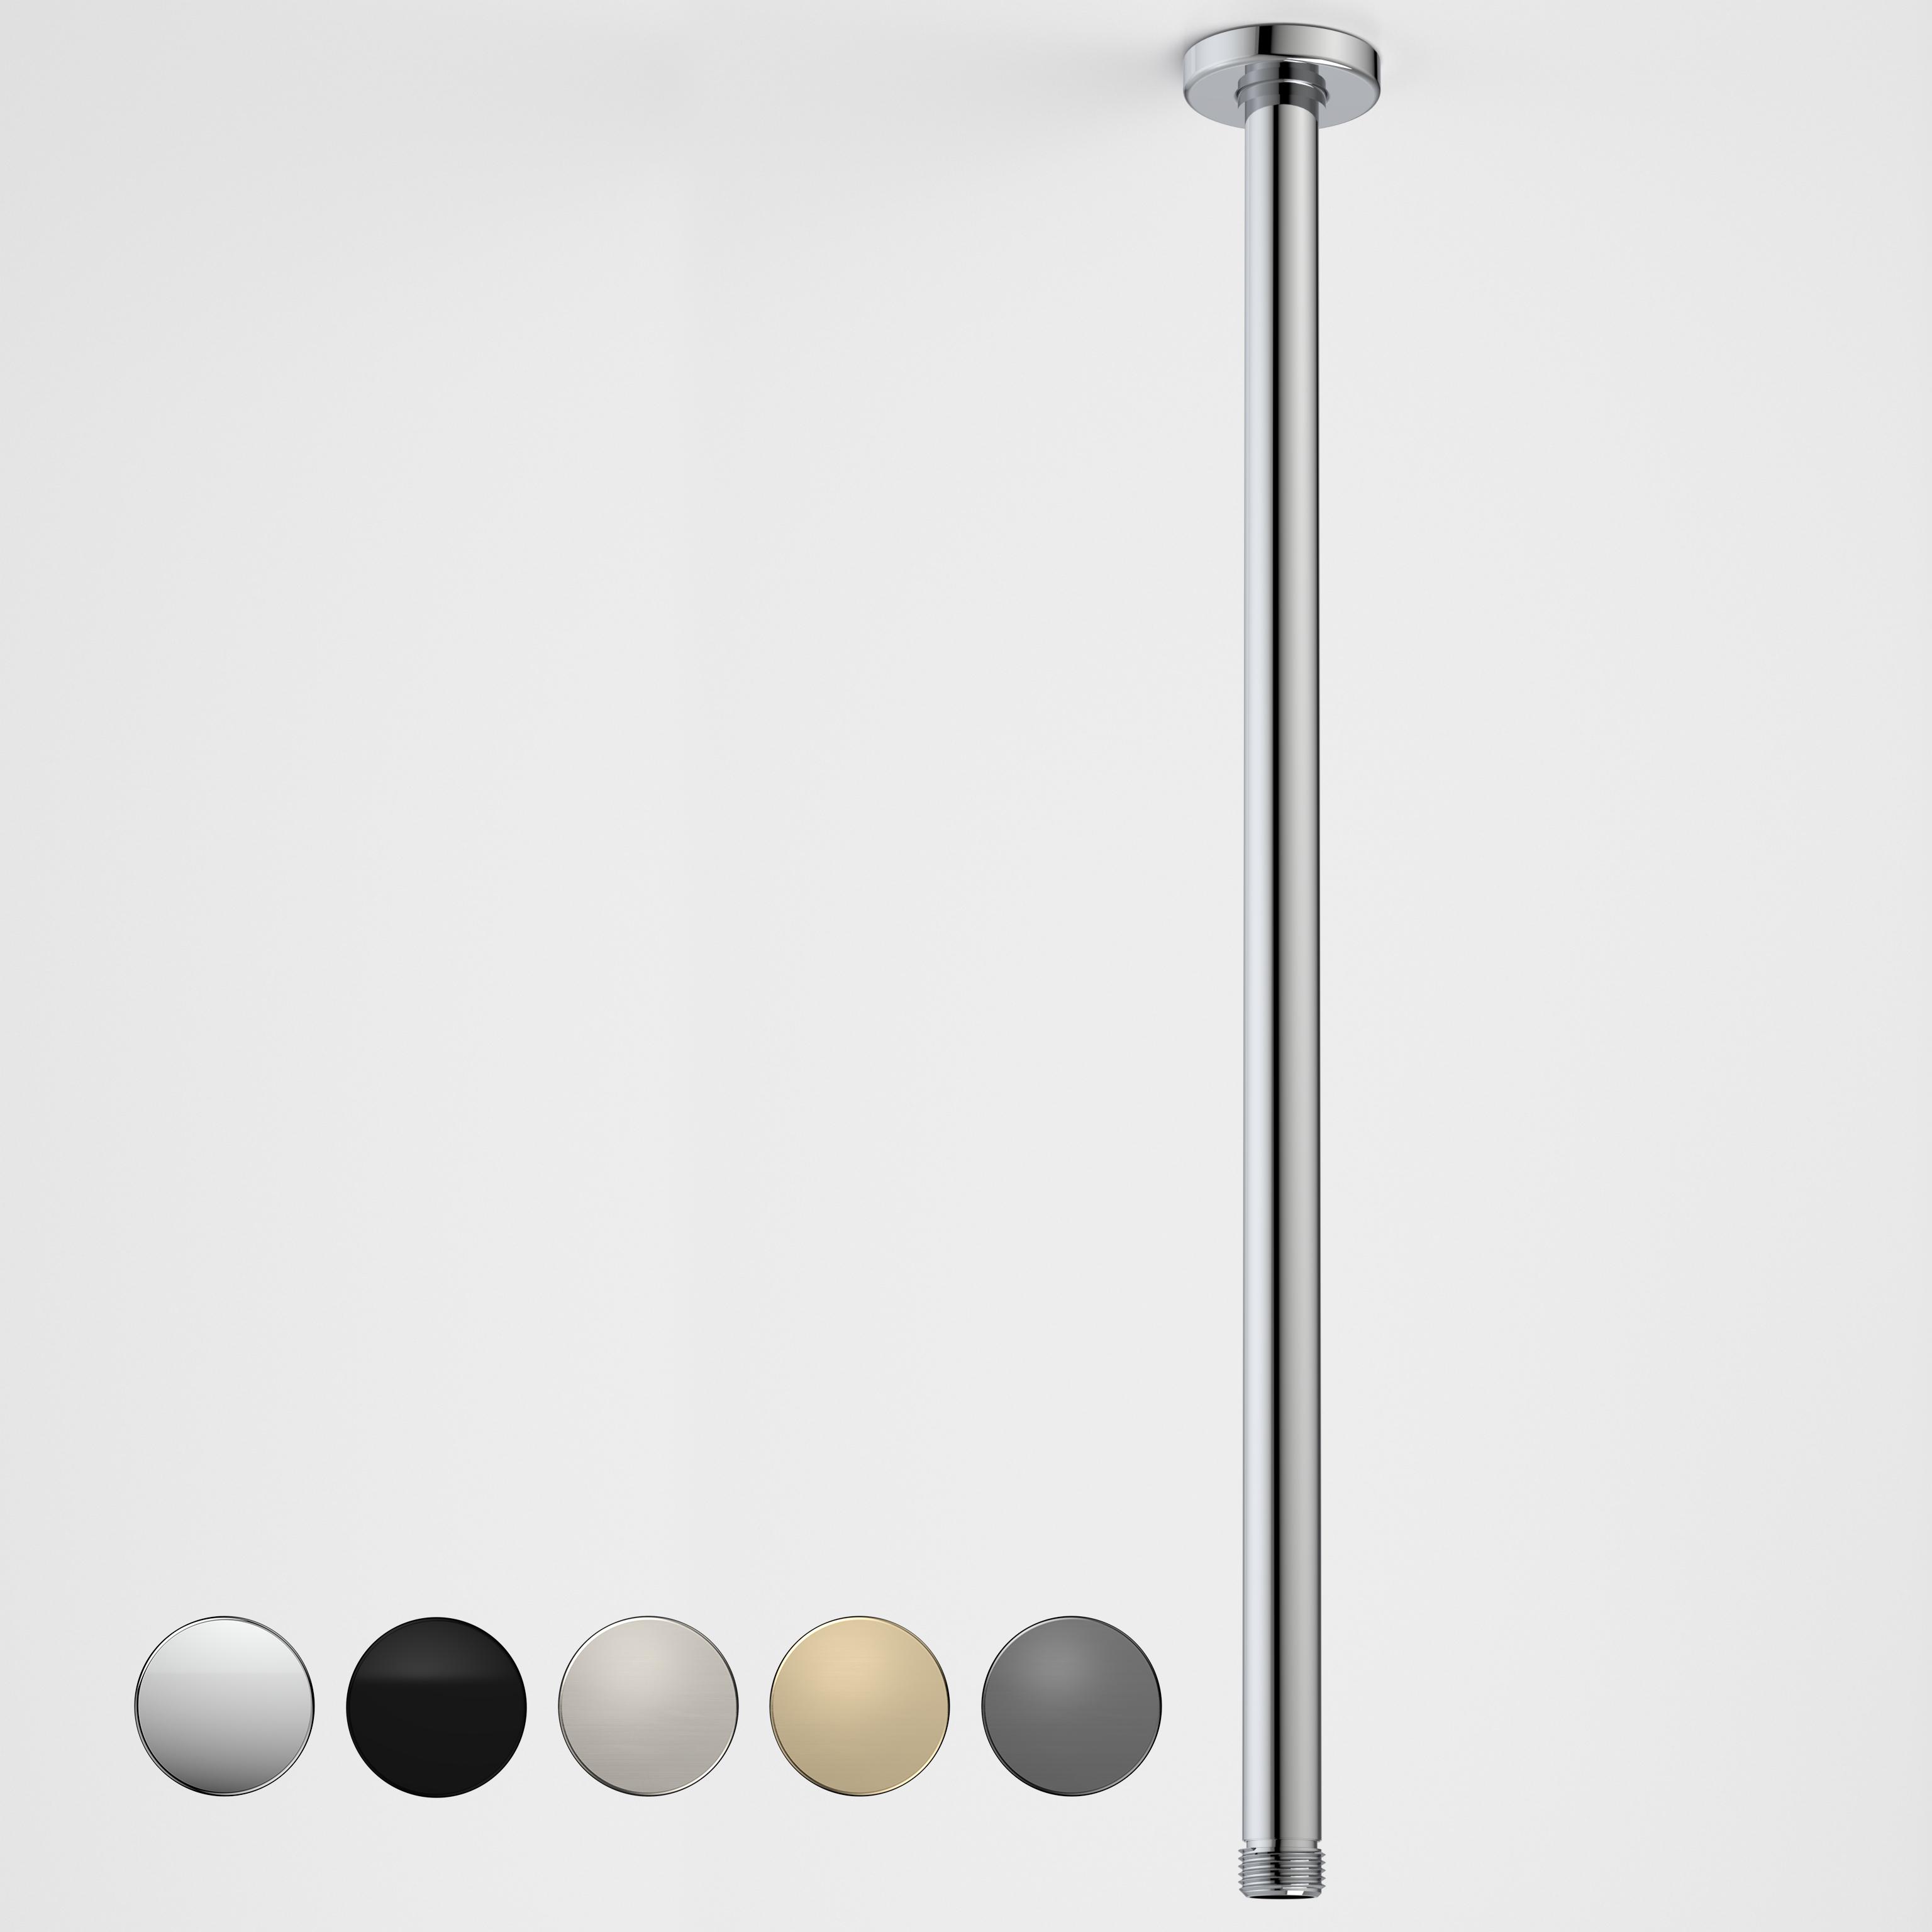 Urbane II 500mm Ceiling Shower Arm